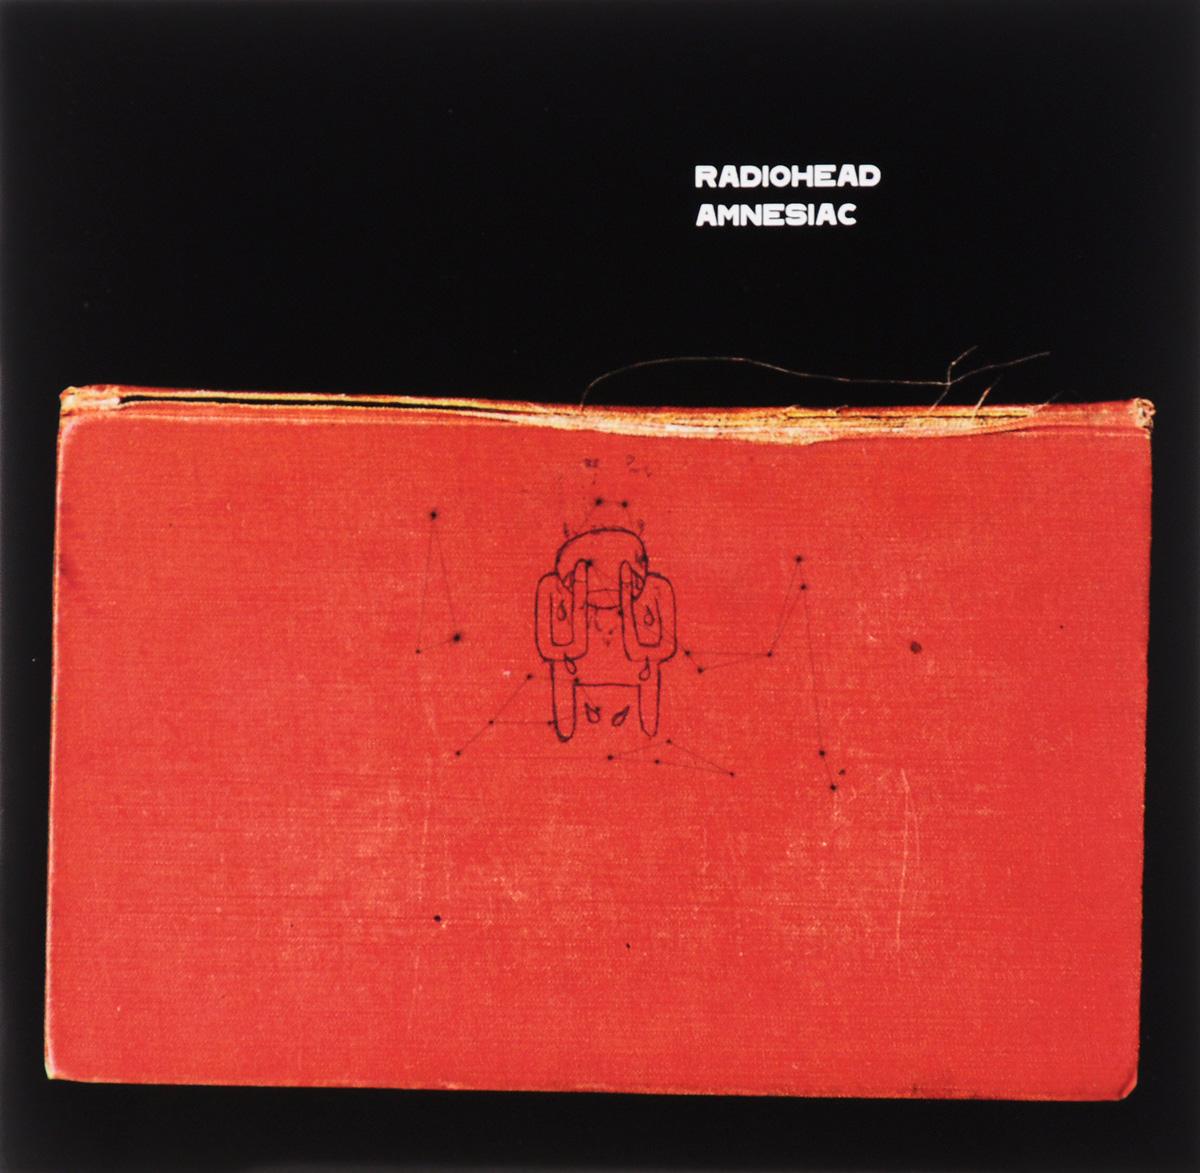 Radiohead. Amnesiac olto cch 2103 автомобильное зарядное устройство page 4